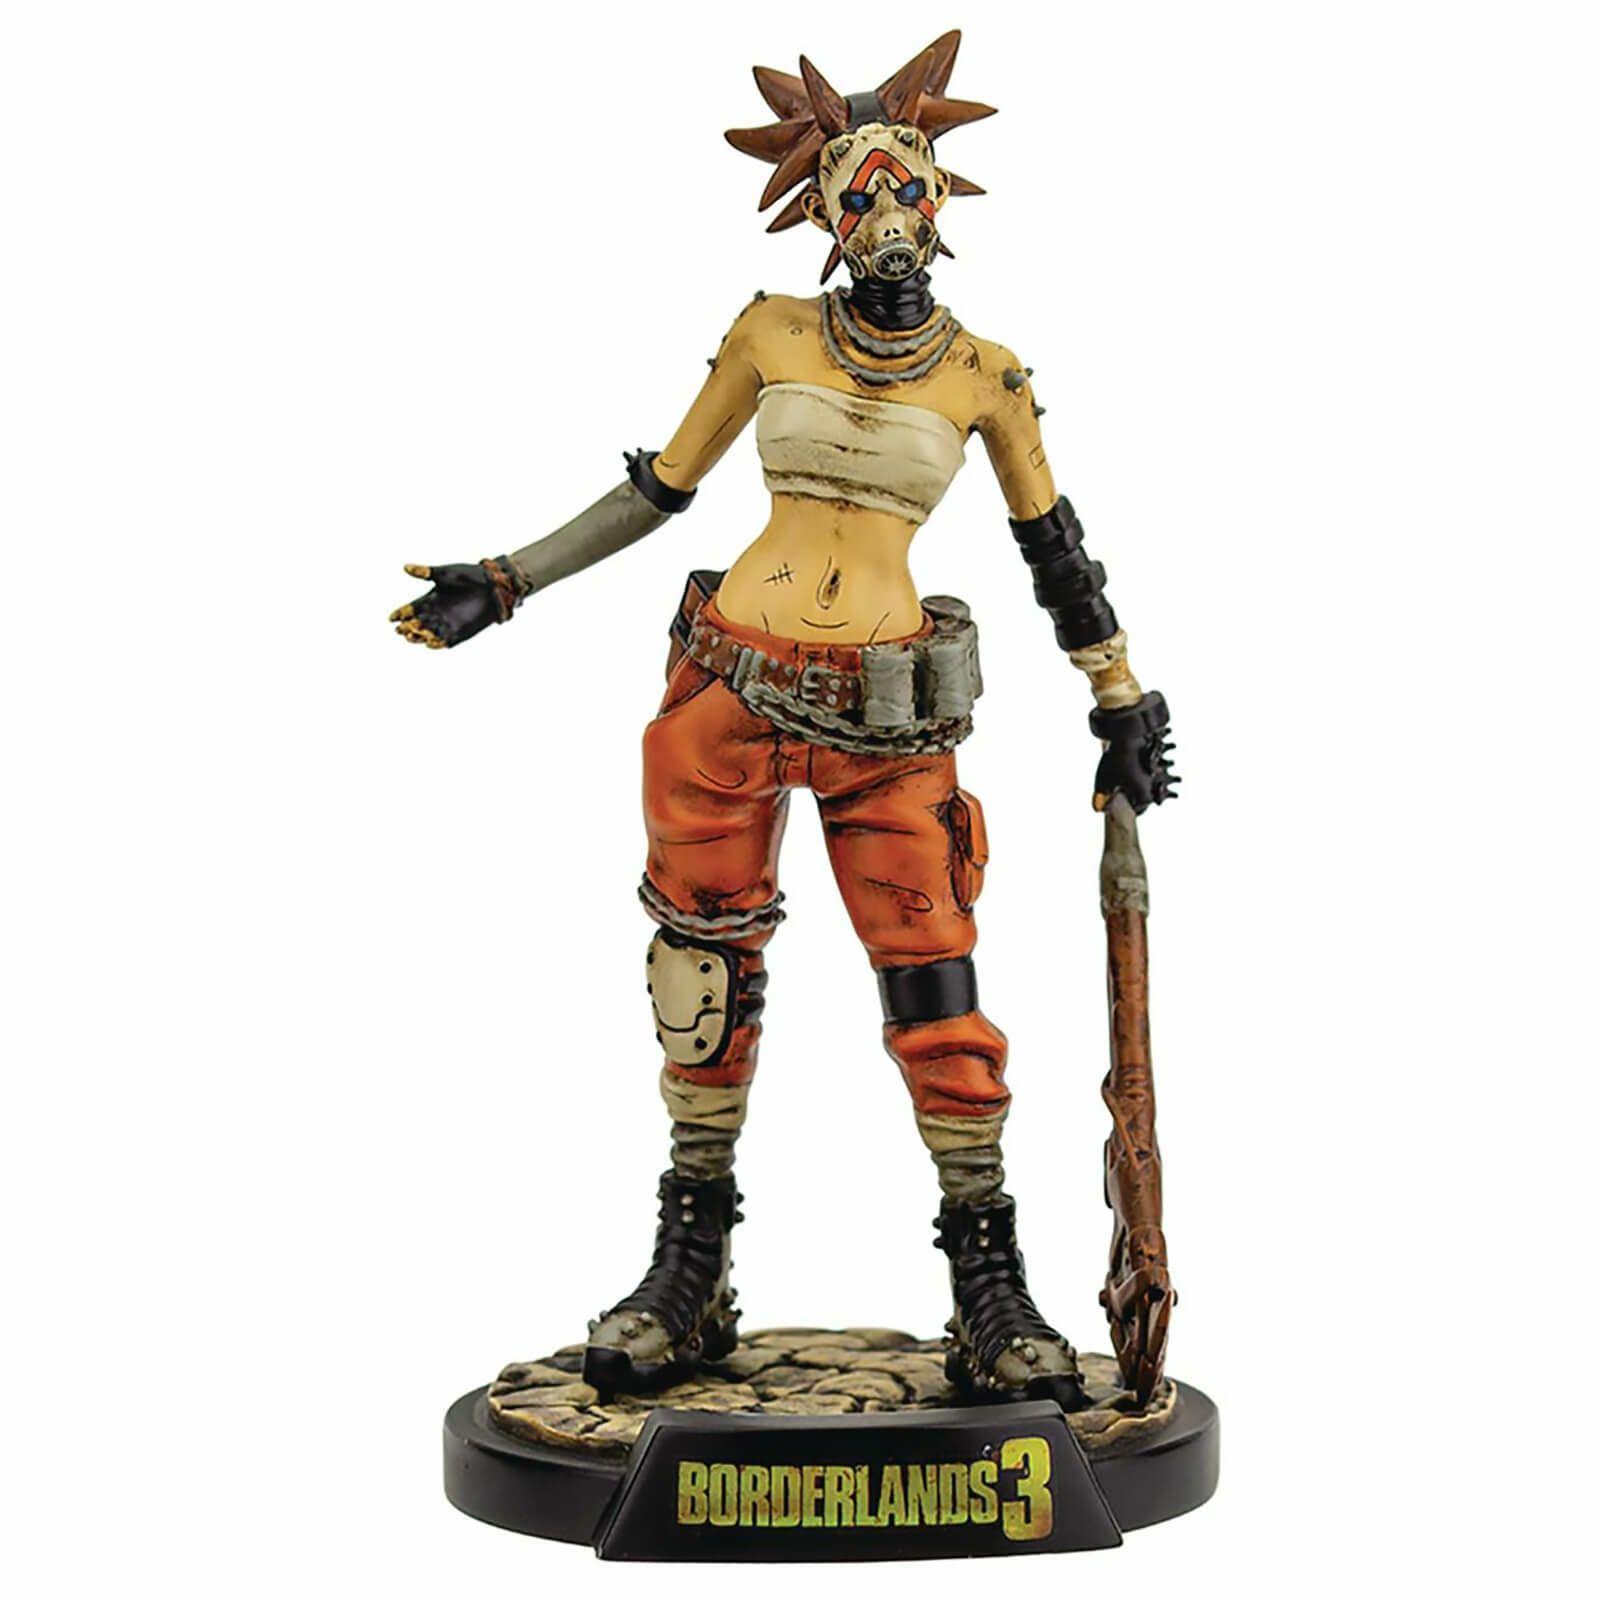 "Coop Borderlands 7"" Female Psycho Bandit Vinyl Figure - Figura coleccionista chica"